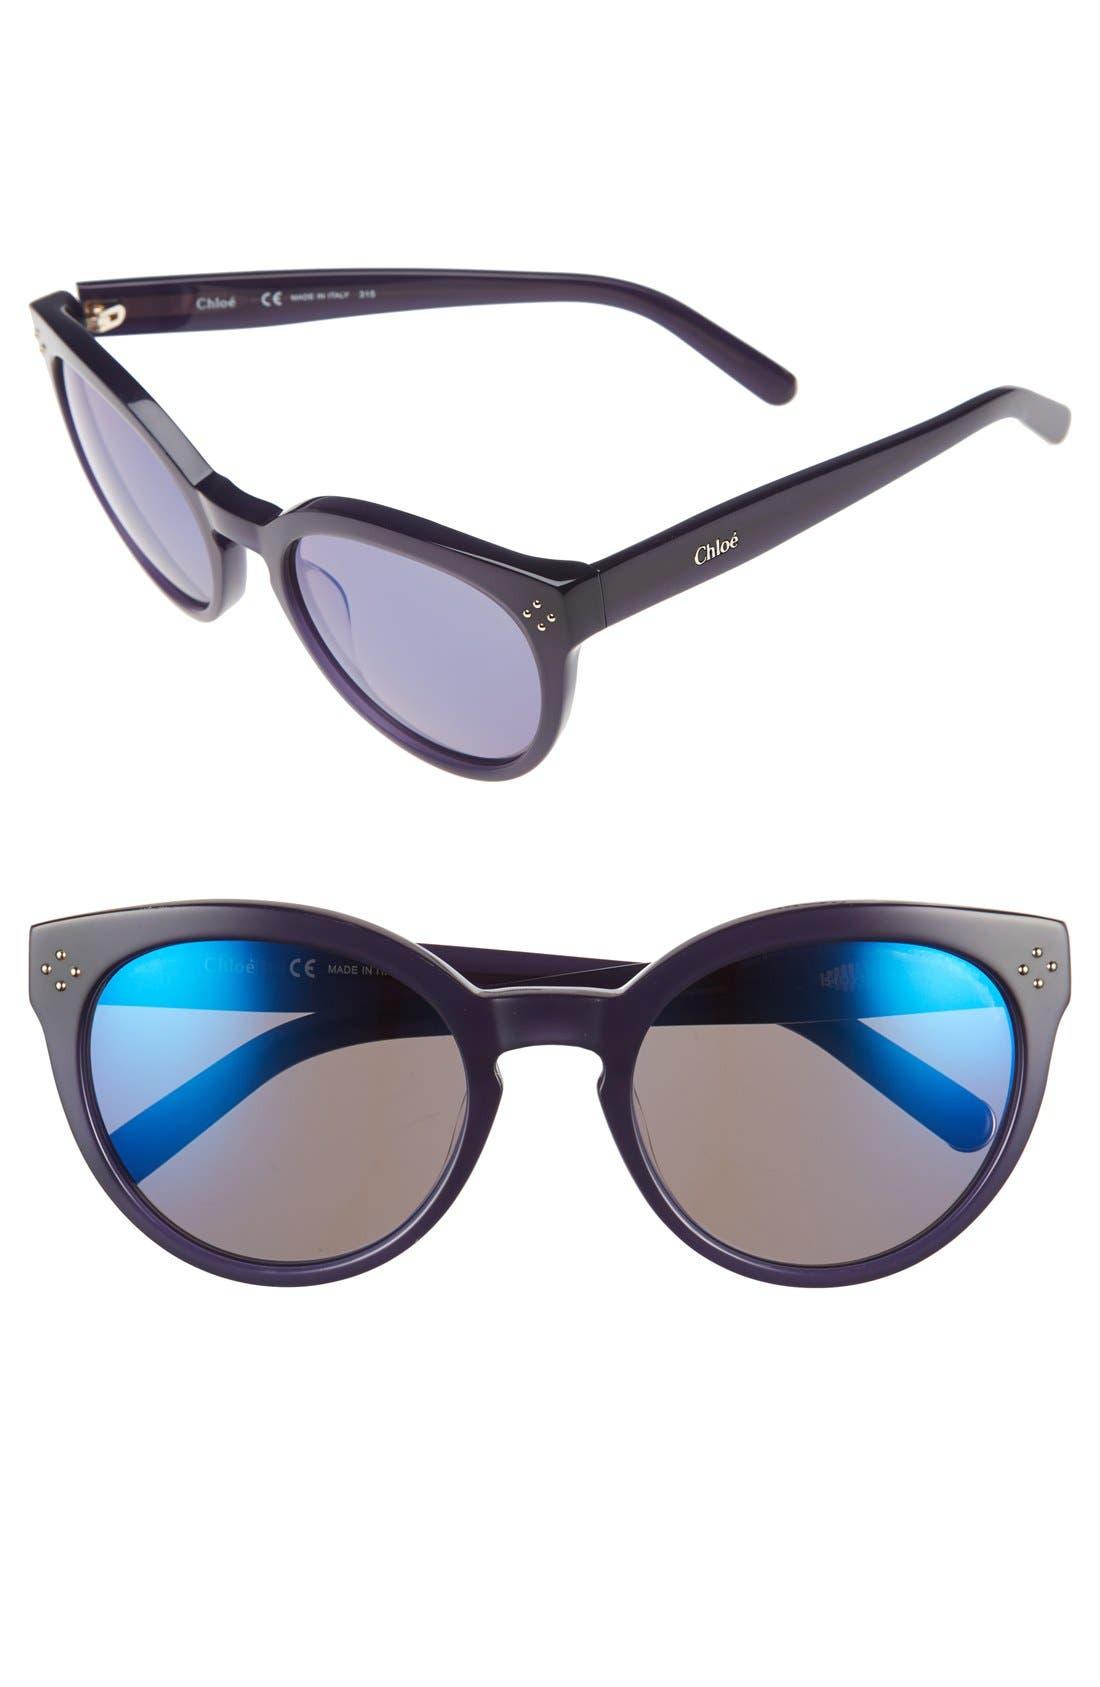 Main Image - Chloé 'Boxwood' 54mm Round Sunglasses